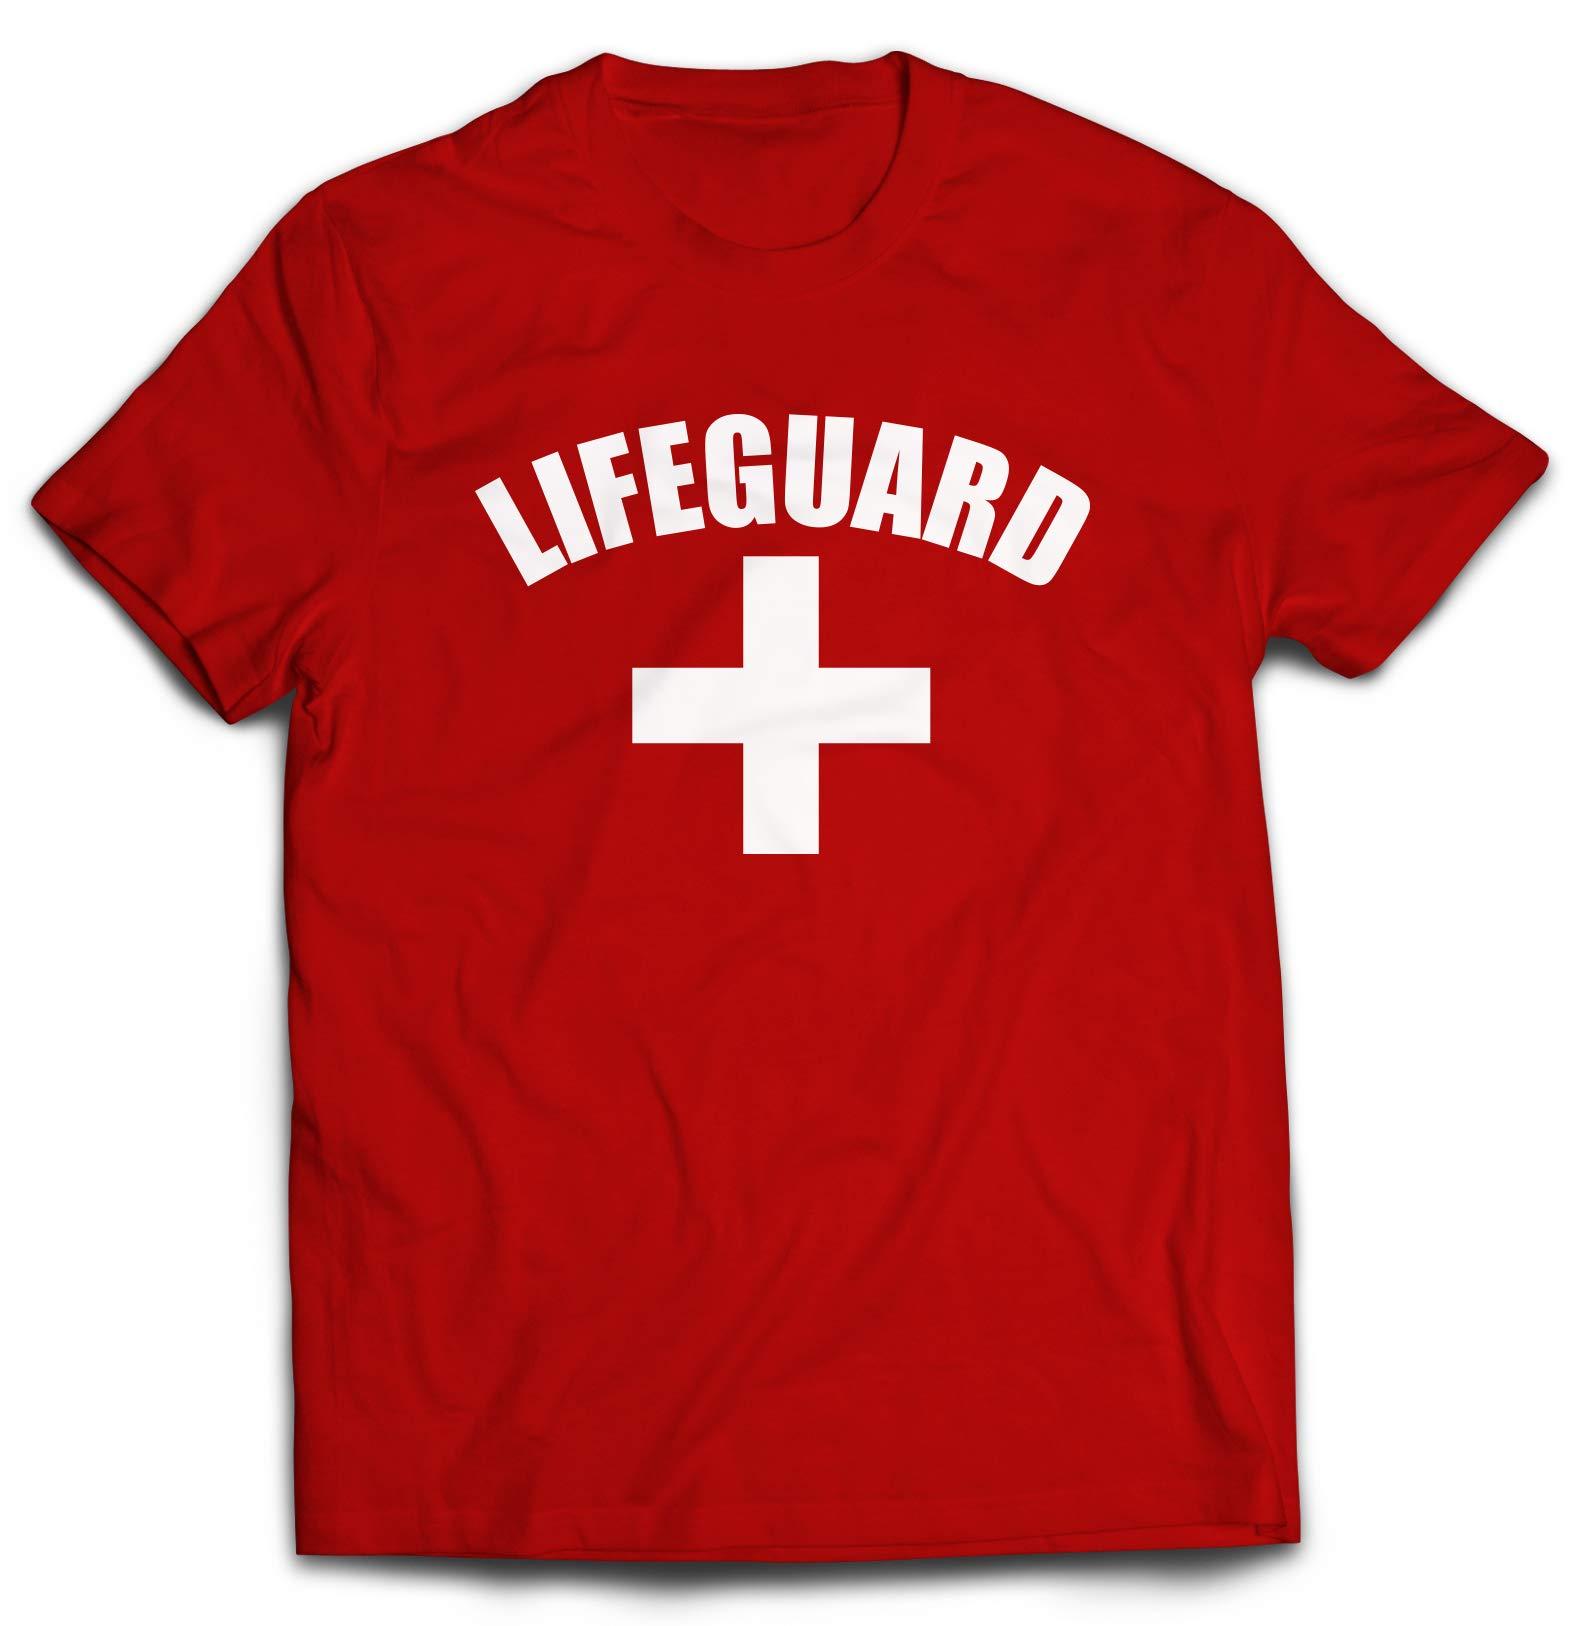 Revel Shore Lifeguard Pool Ymca 1551 Shirts